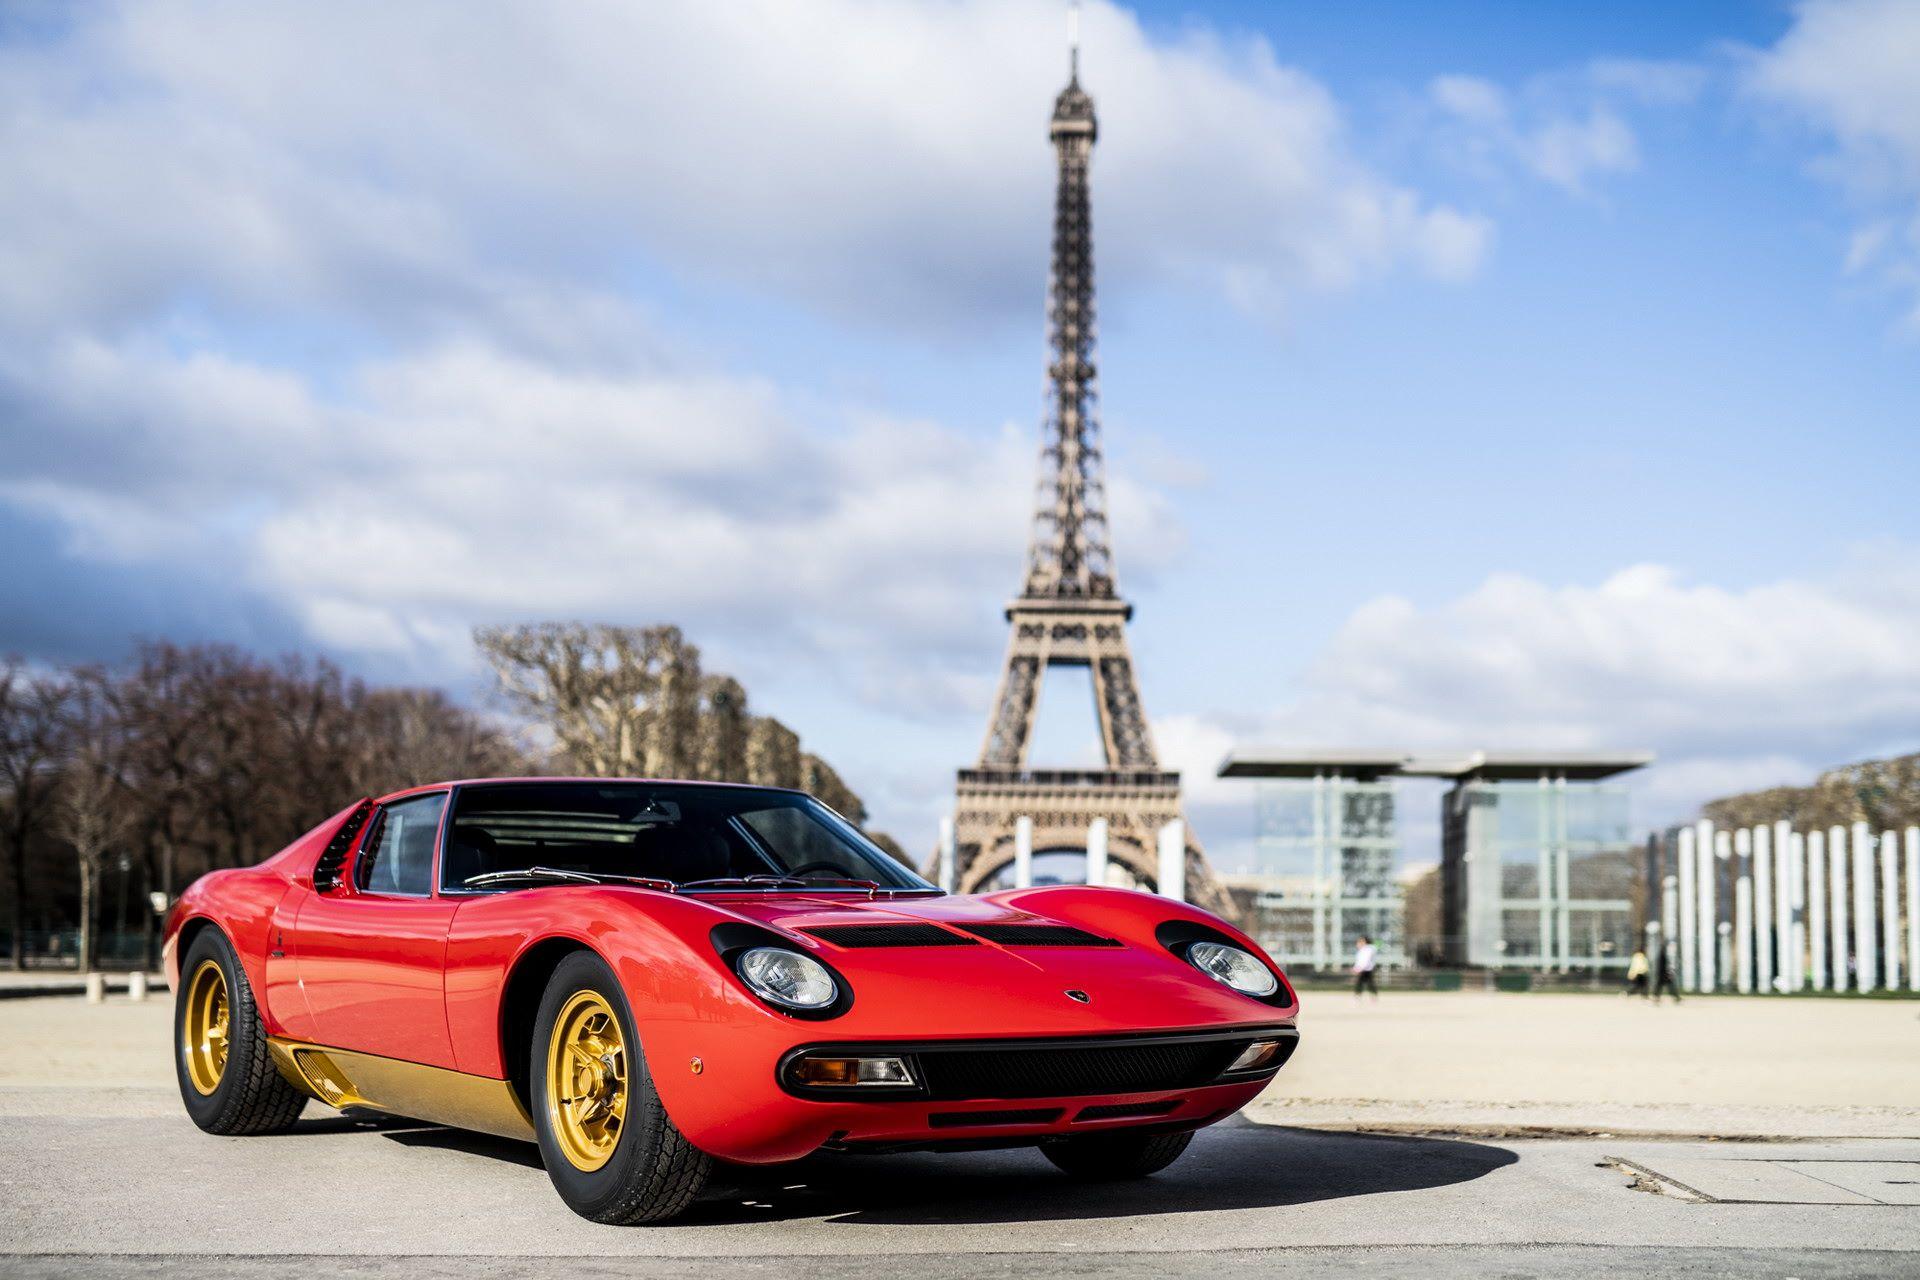 Lamborghini-Miura-SV-turns-50-13